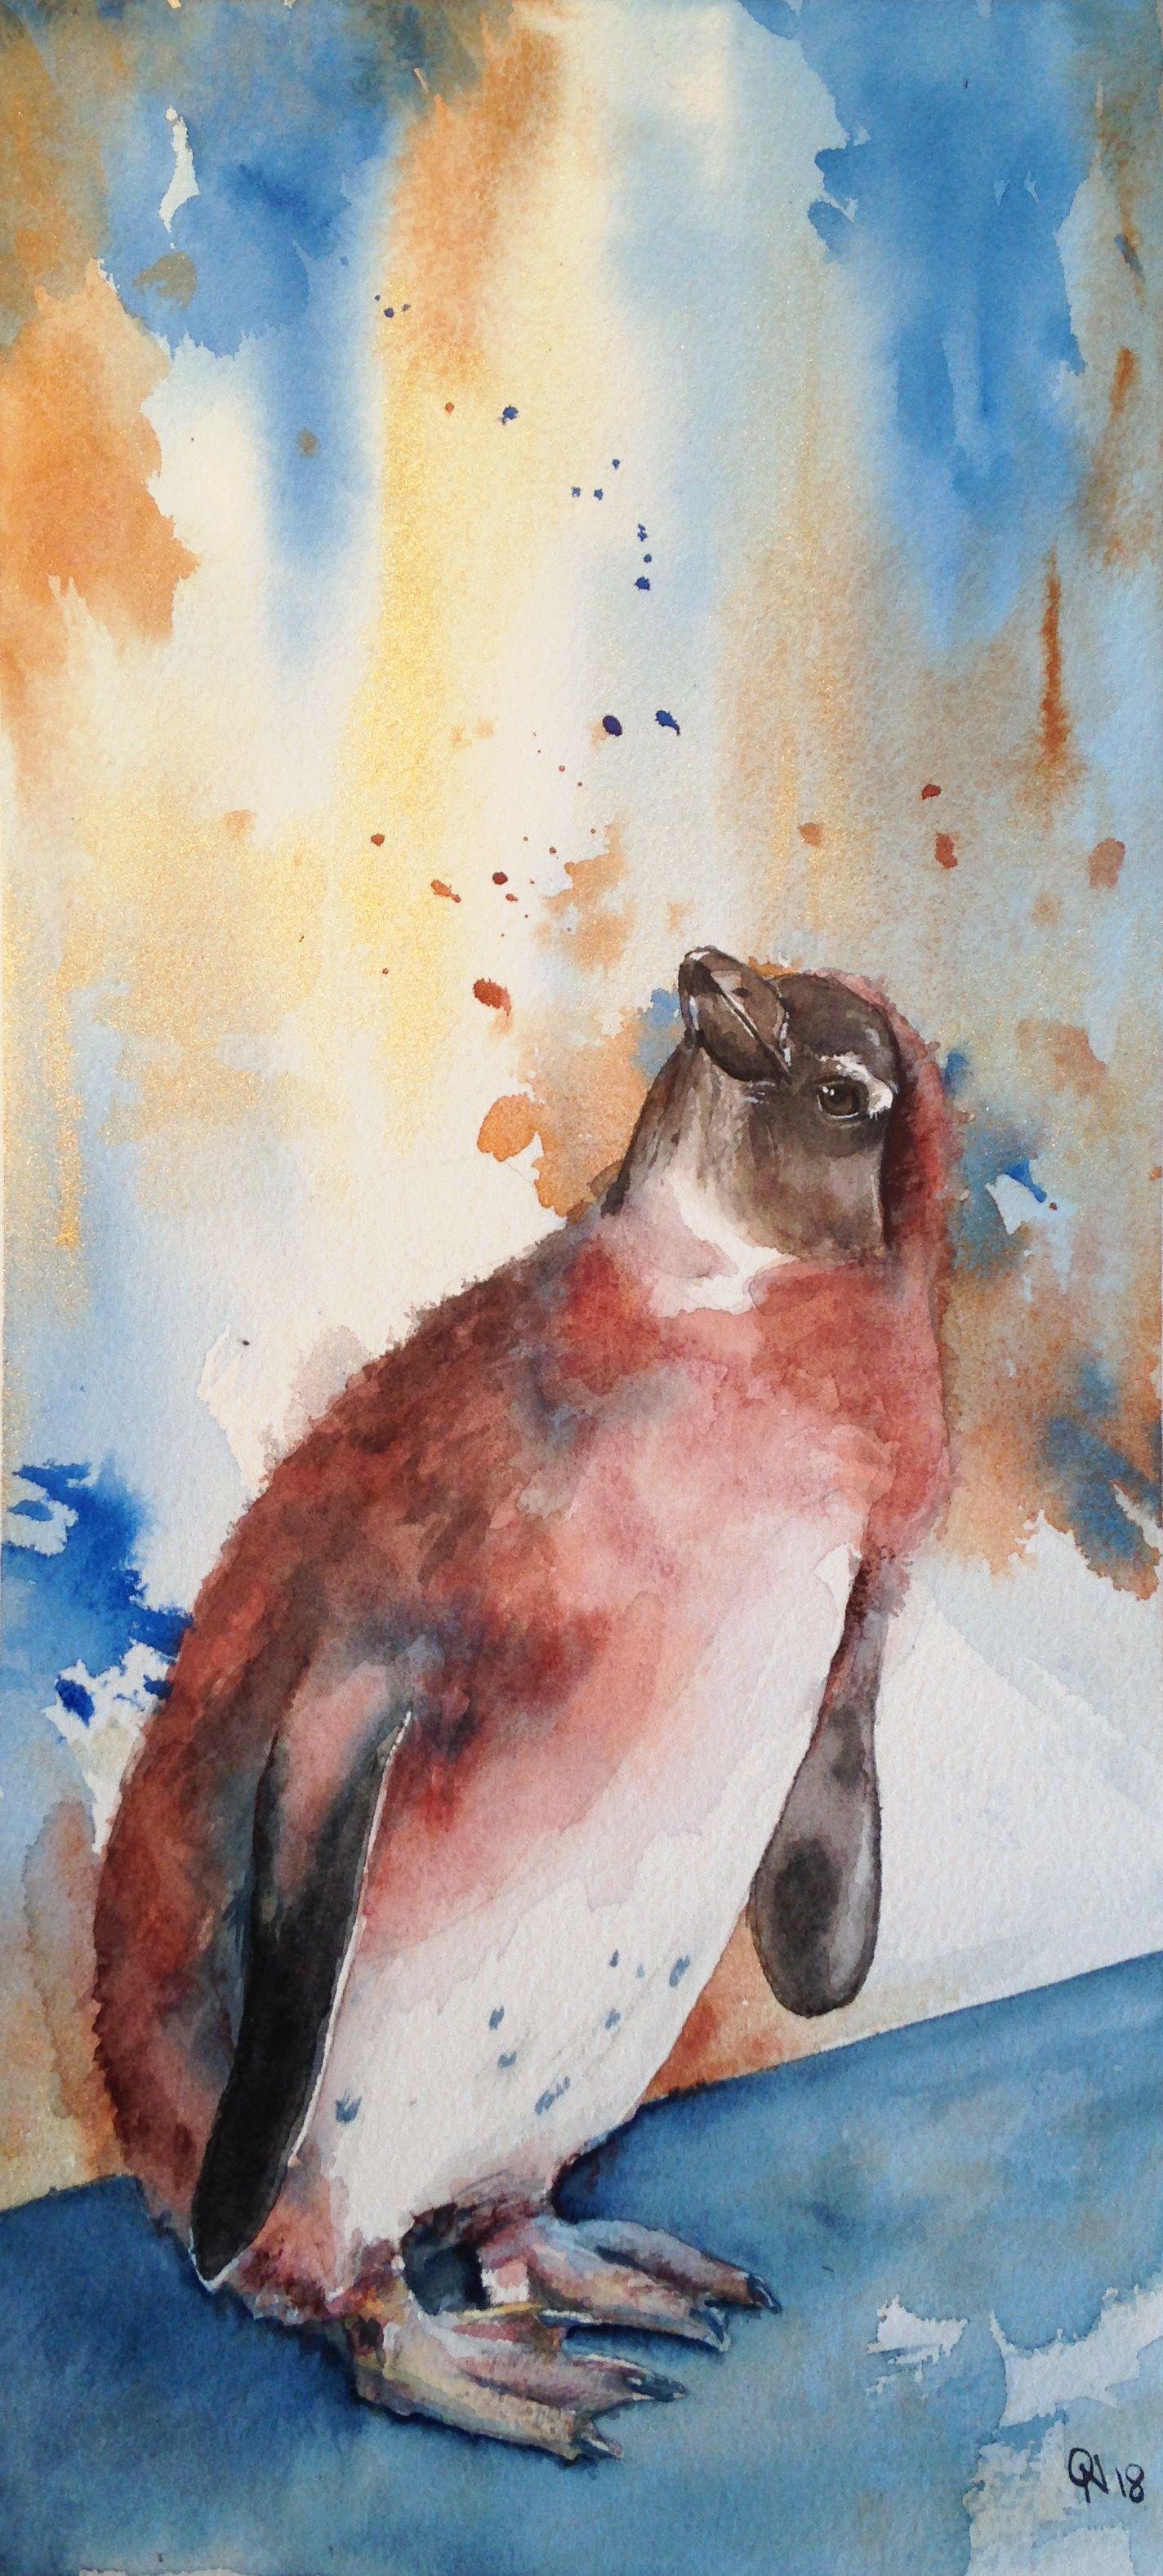 Manchot Animal Aquarelle Pingouin Zoo Dessin Art Peinture